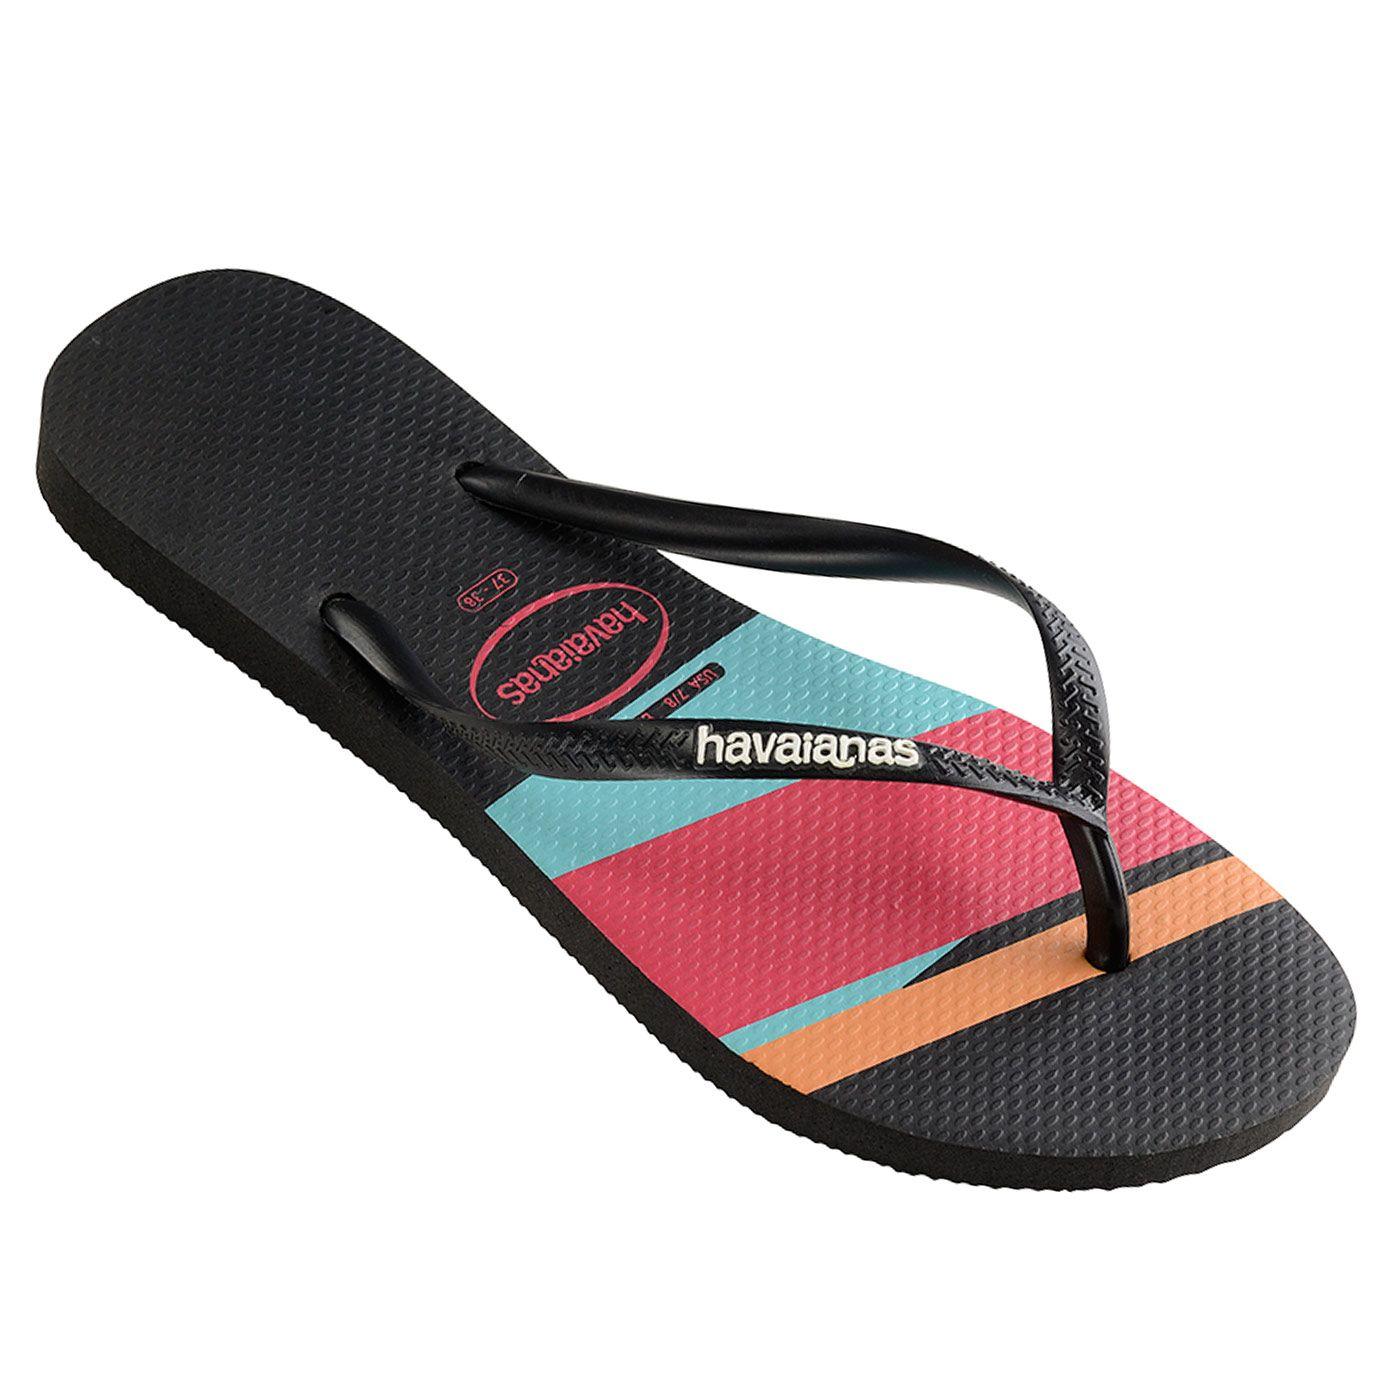 3eb8315b6efa Havaianas Slim Stripes (Block) Black Colour Thongs. Rock the block this  summer